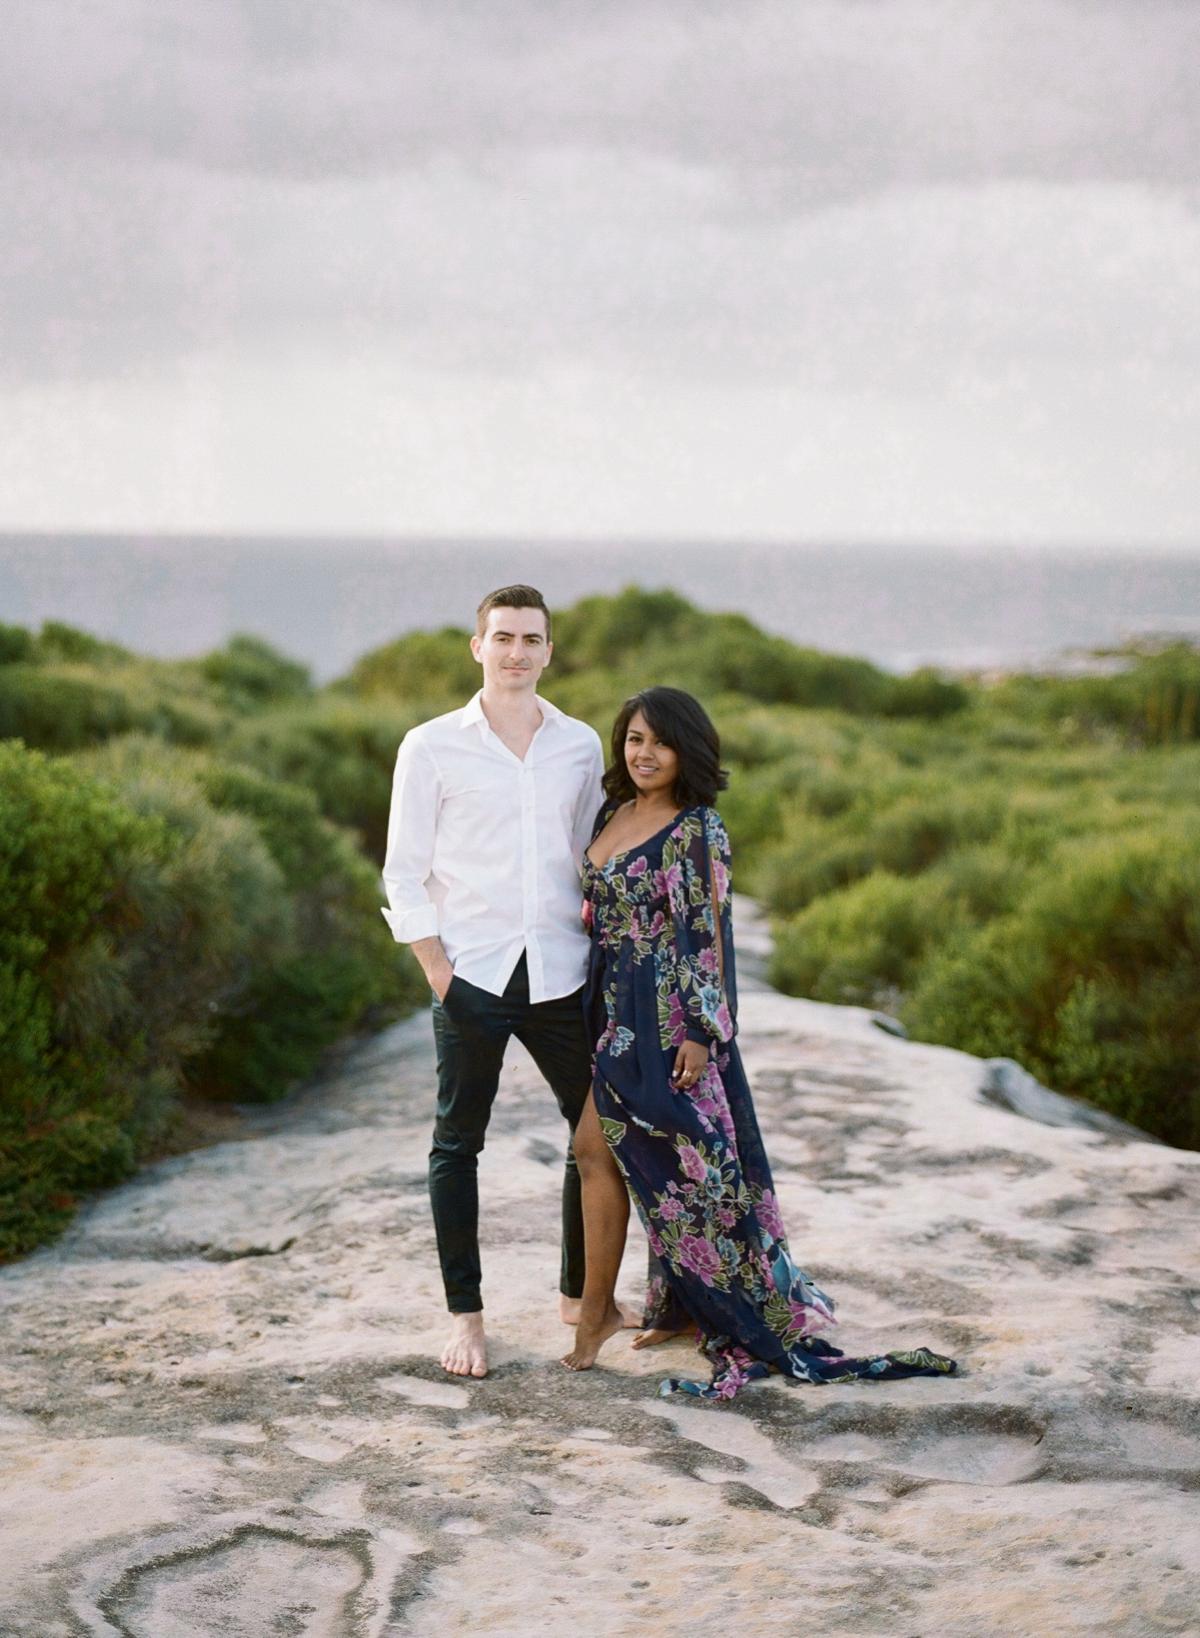 Coastal Sydney couples session by Mr Edwards Photography_0737_1123.jpg